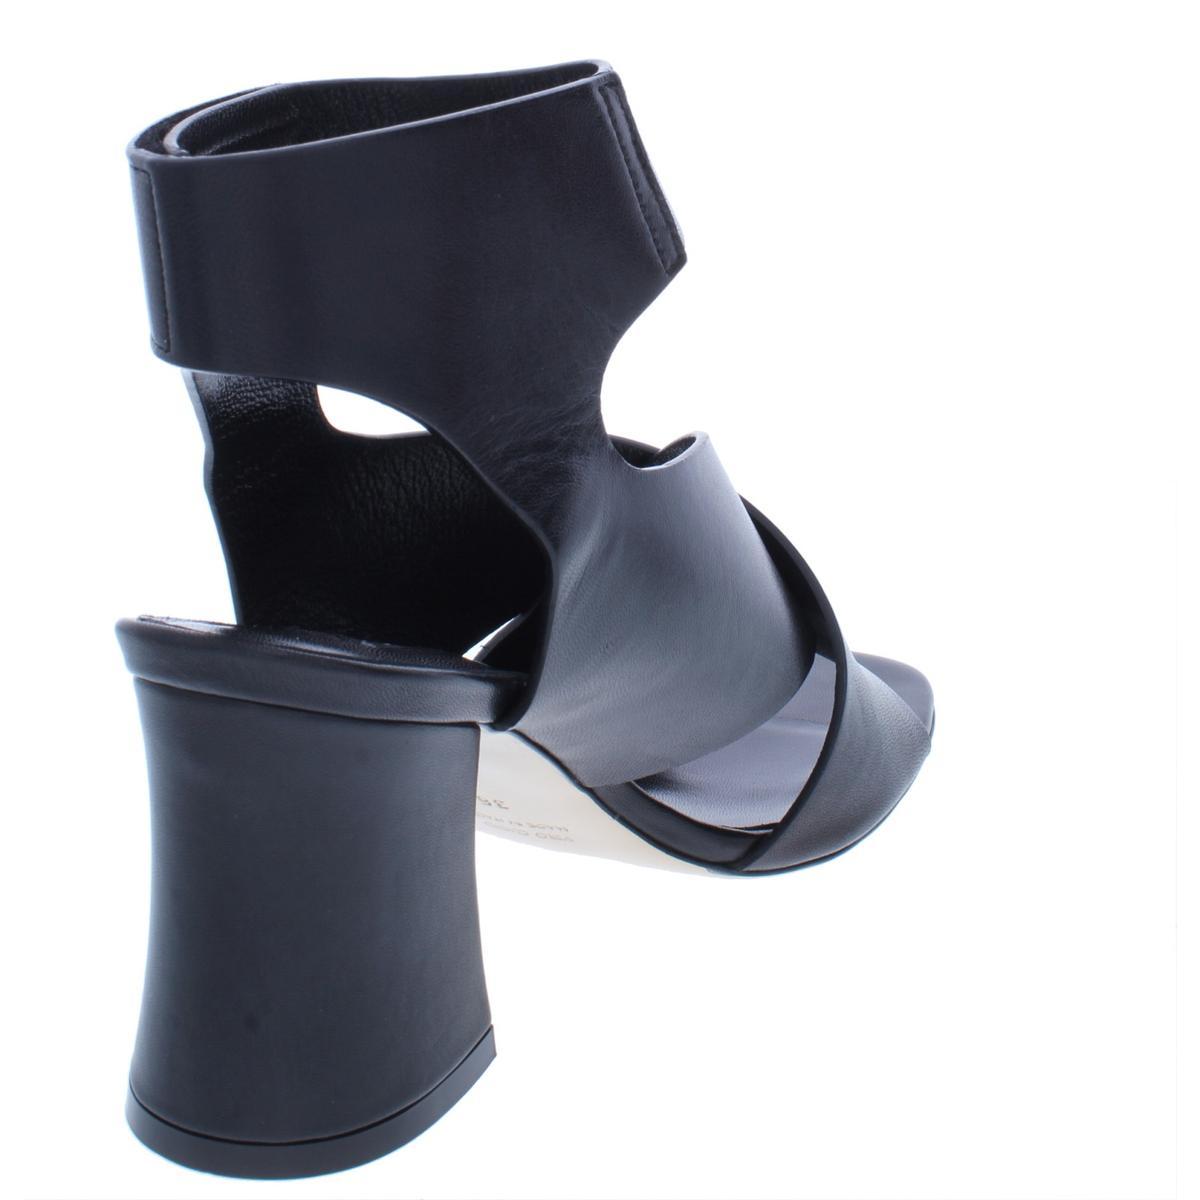 Steven-By-Steve-Madden-Womens-Kitzy-Crisscross-Dress-Sandals-Shoes-BHFO-5760 thumbnail 10